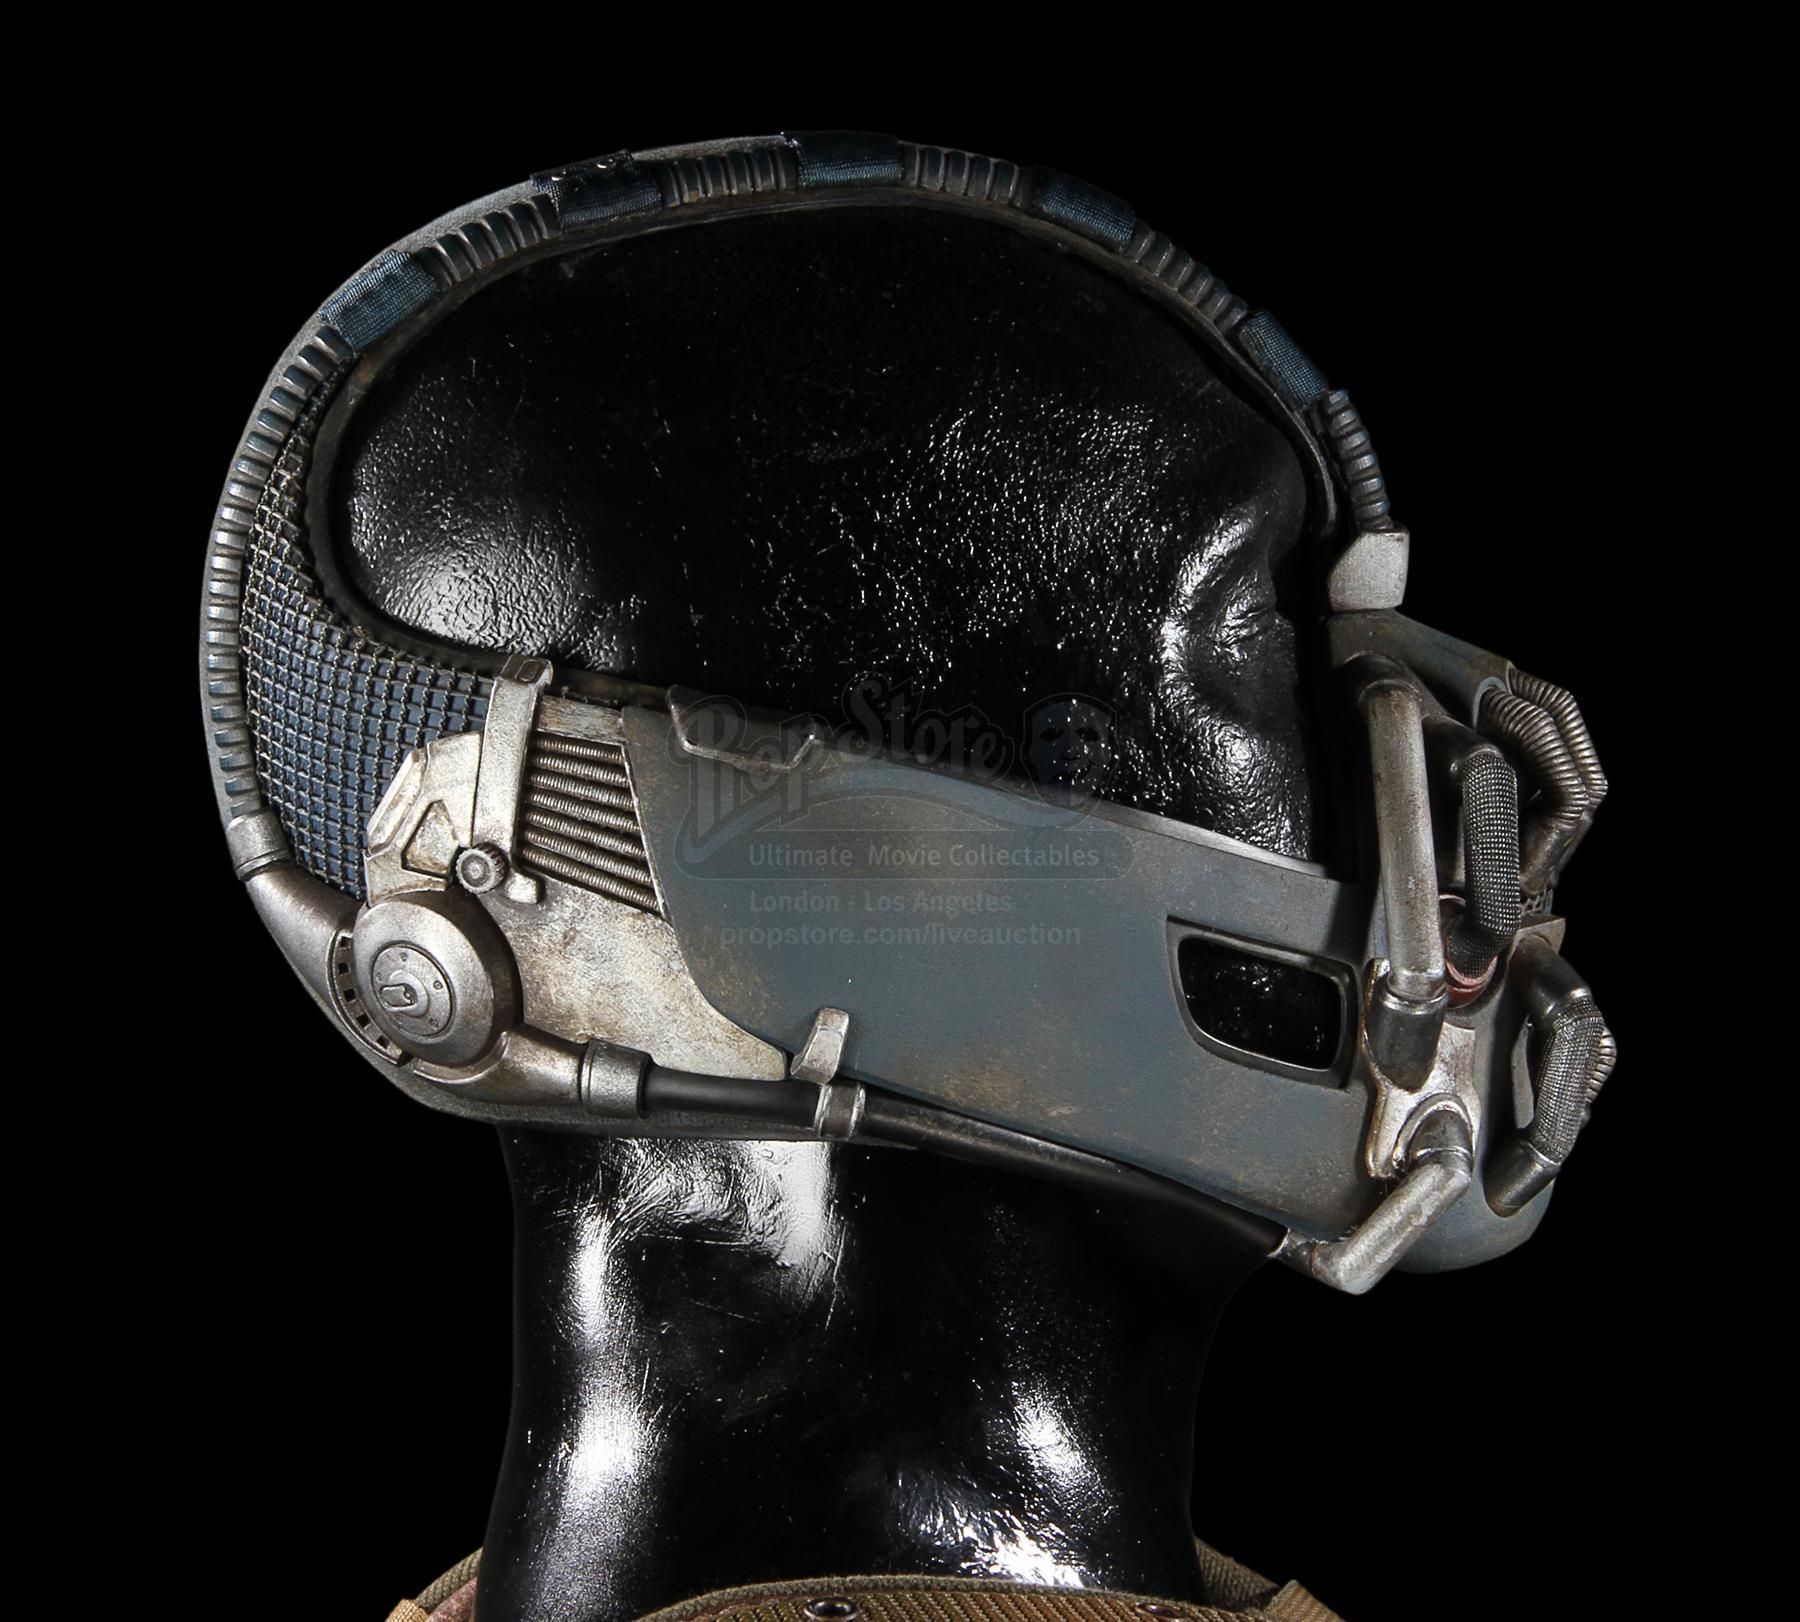 Lot # 545. Baneu0027s (Tom Hardy) Costume & THE DARK KNIGHT RISES (2012) - Baneu0027s (Tom Hardy) Costume - Current ...